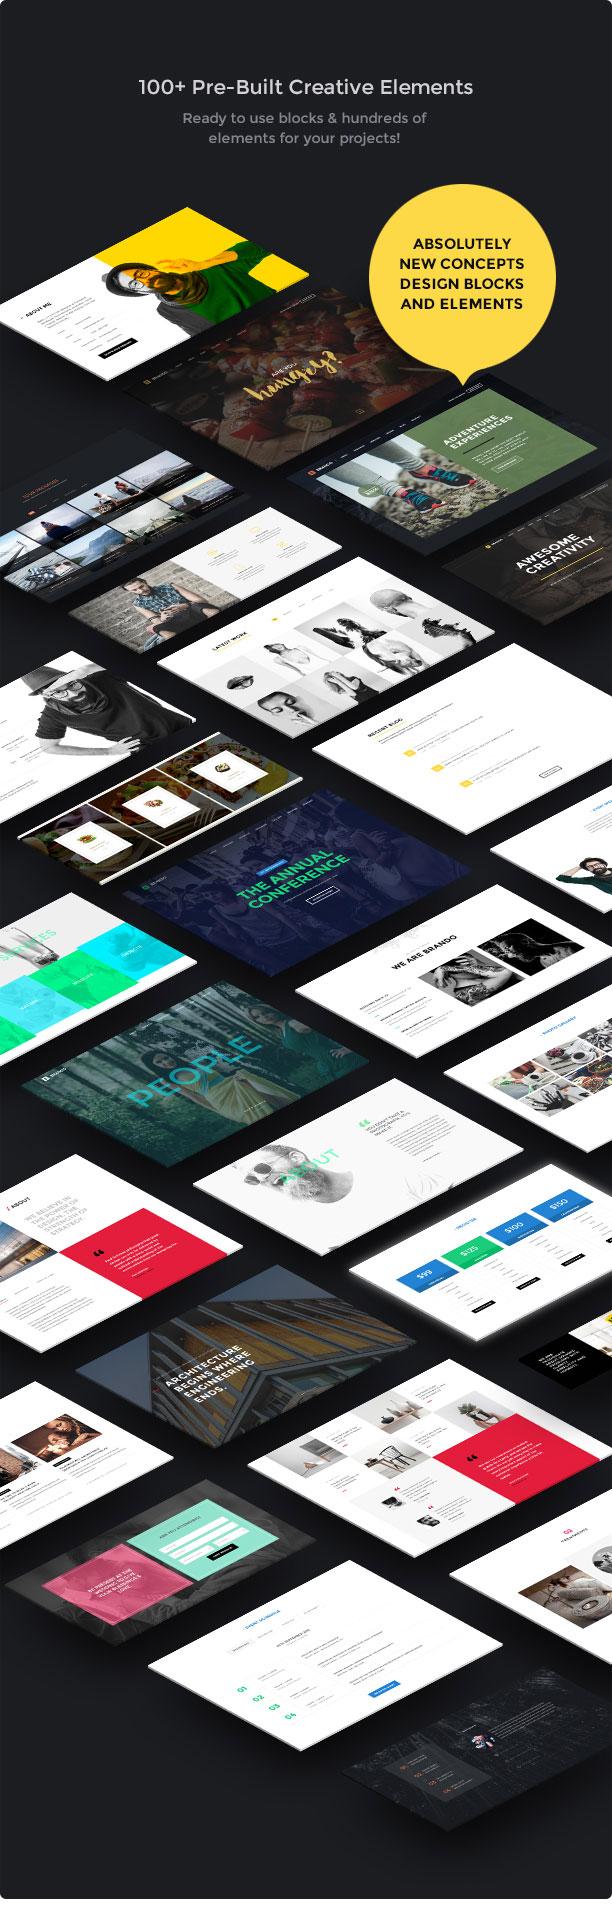 brando wp creative elements new - Brando Responsive and Multipurpose OnePage WordPress Theme